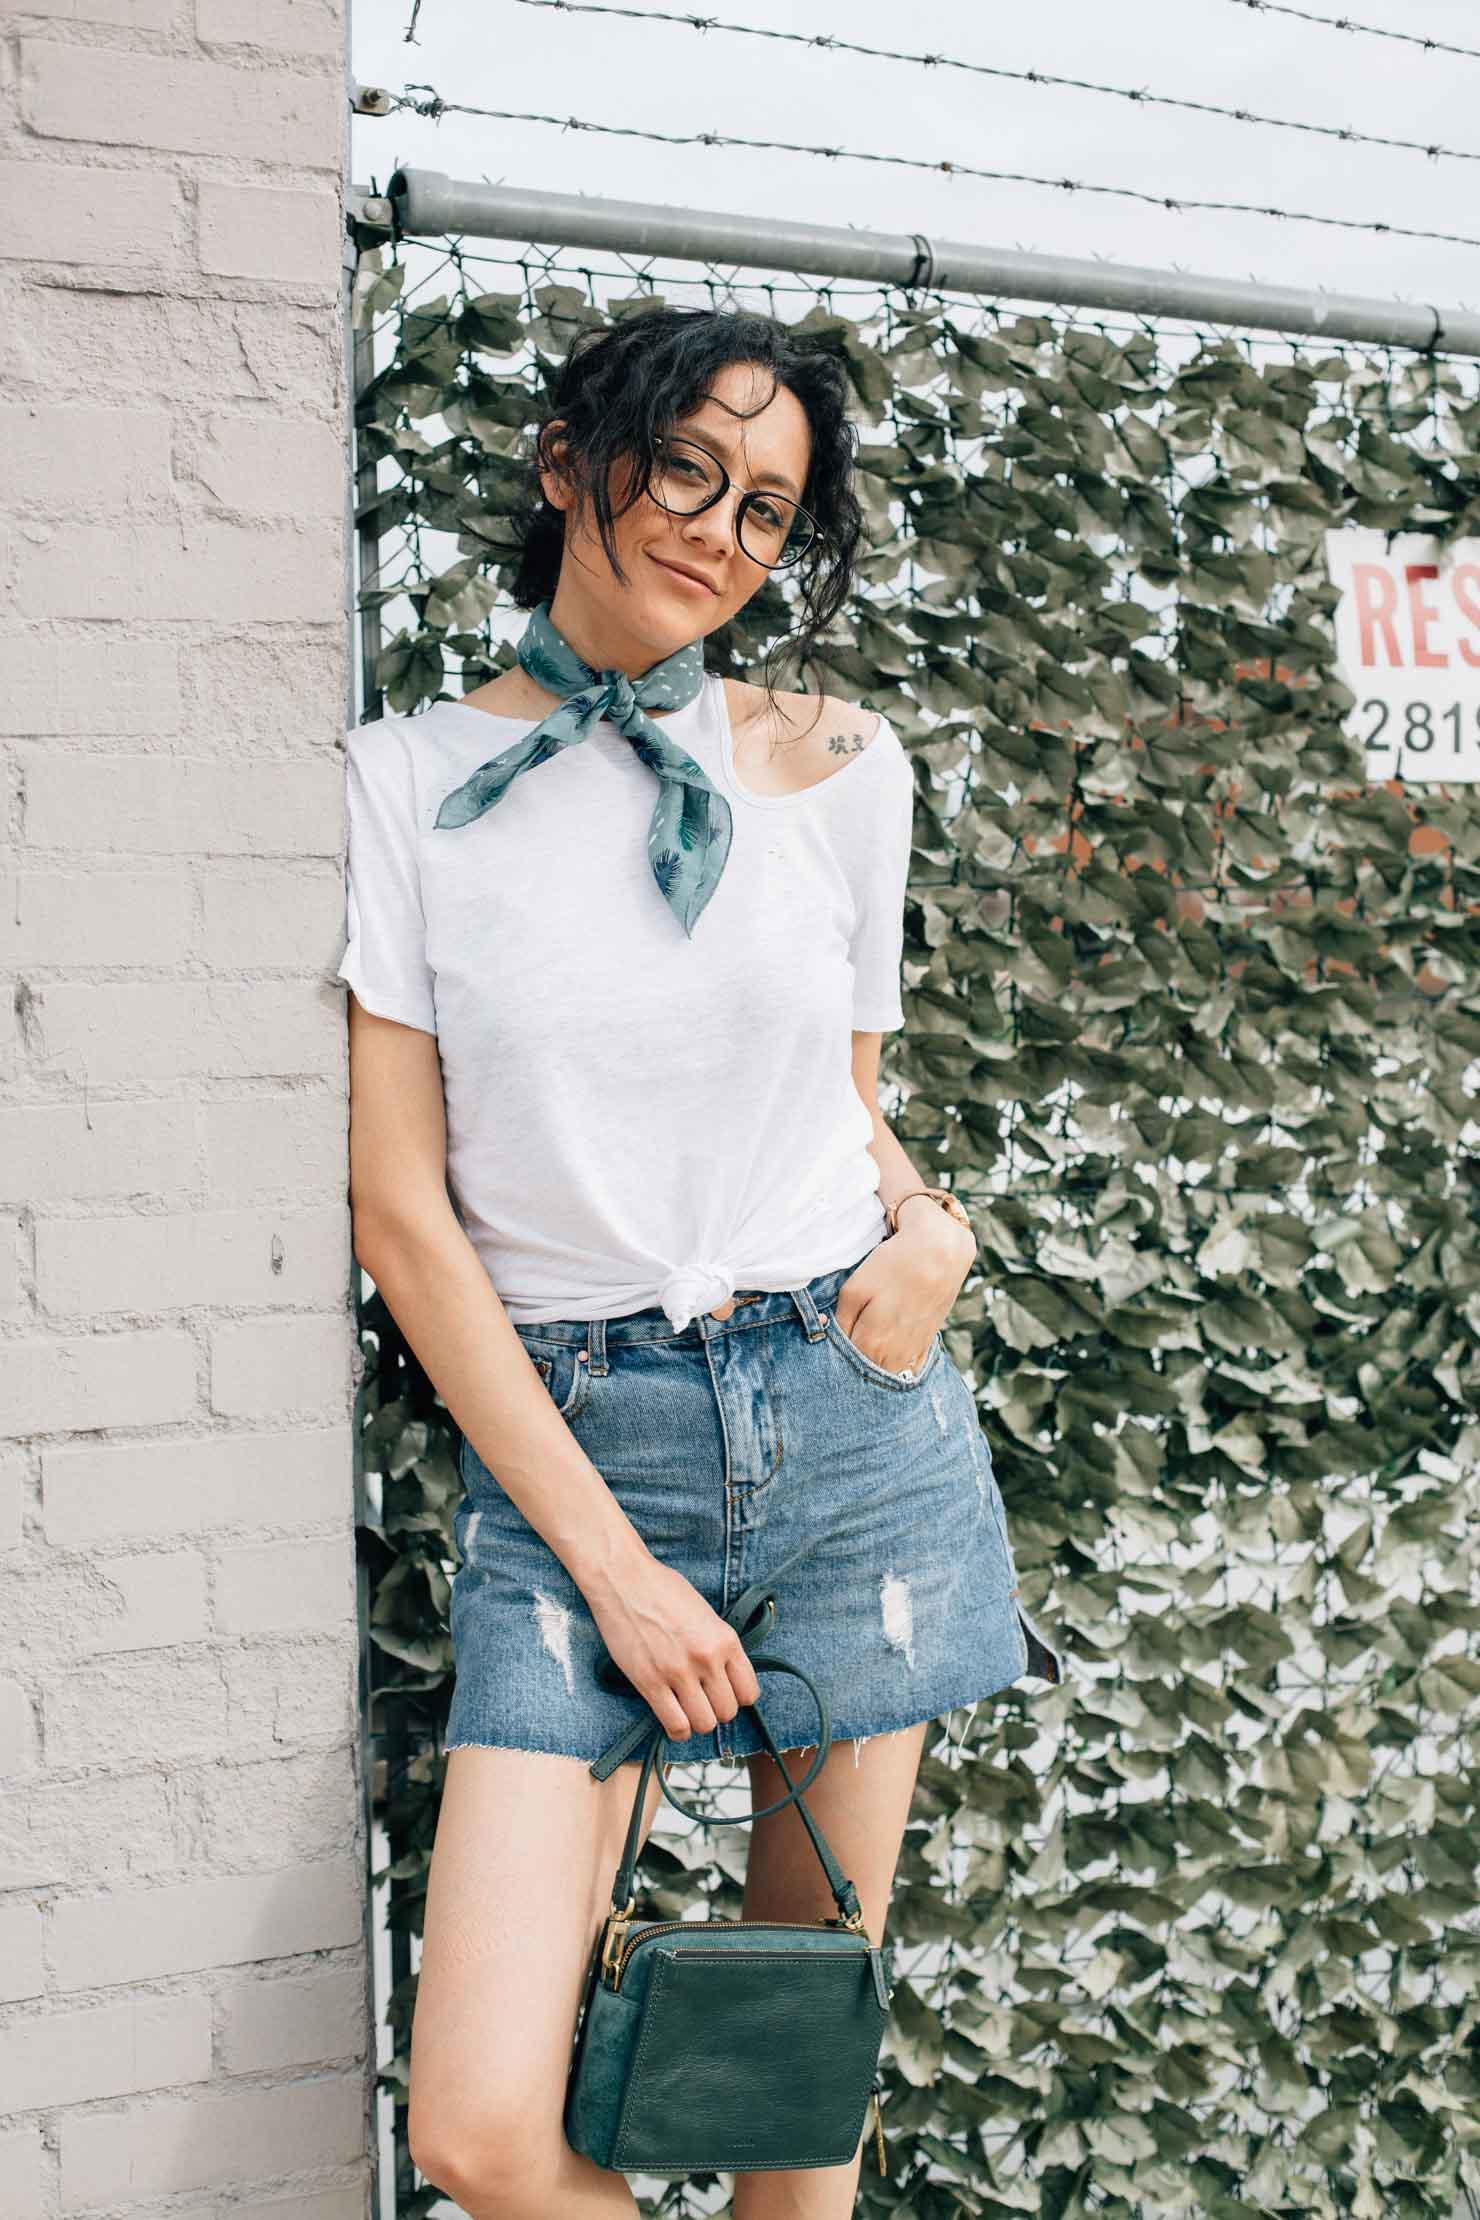 Perfect Effortless Style | Denim skirt, white tee & white sneakers